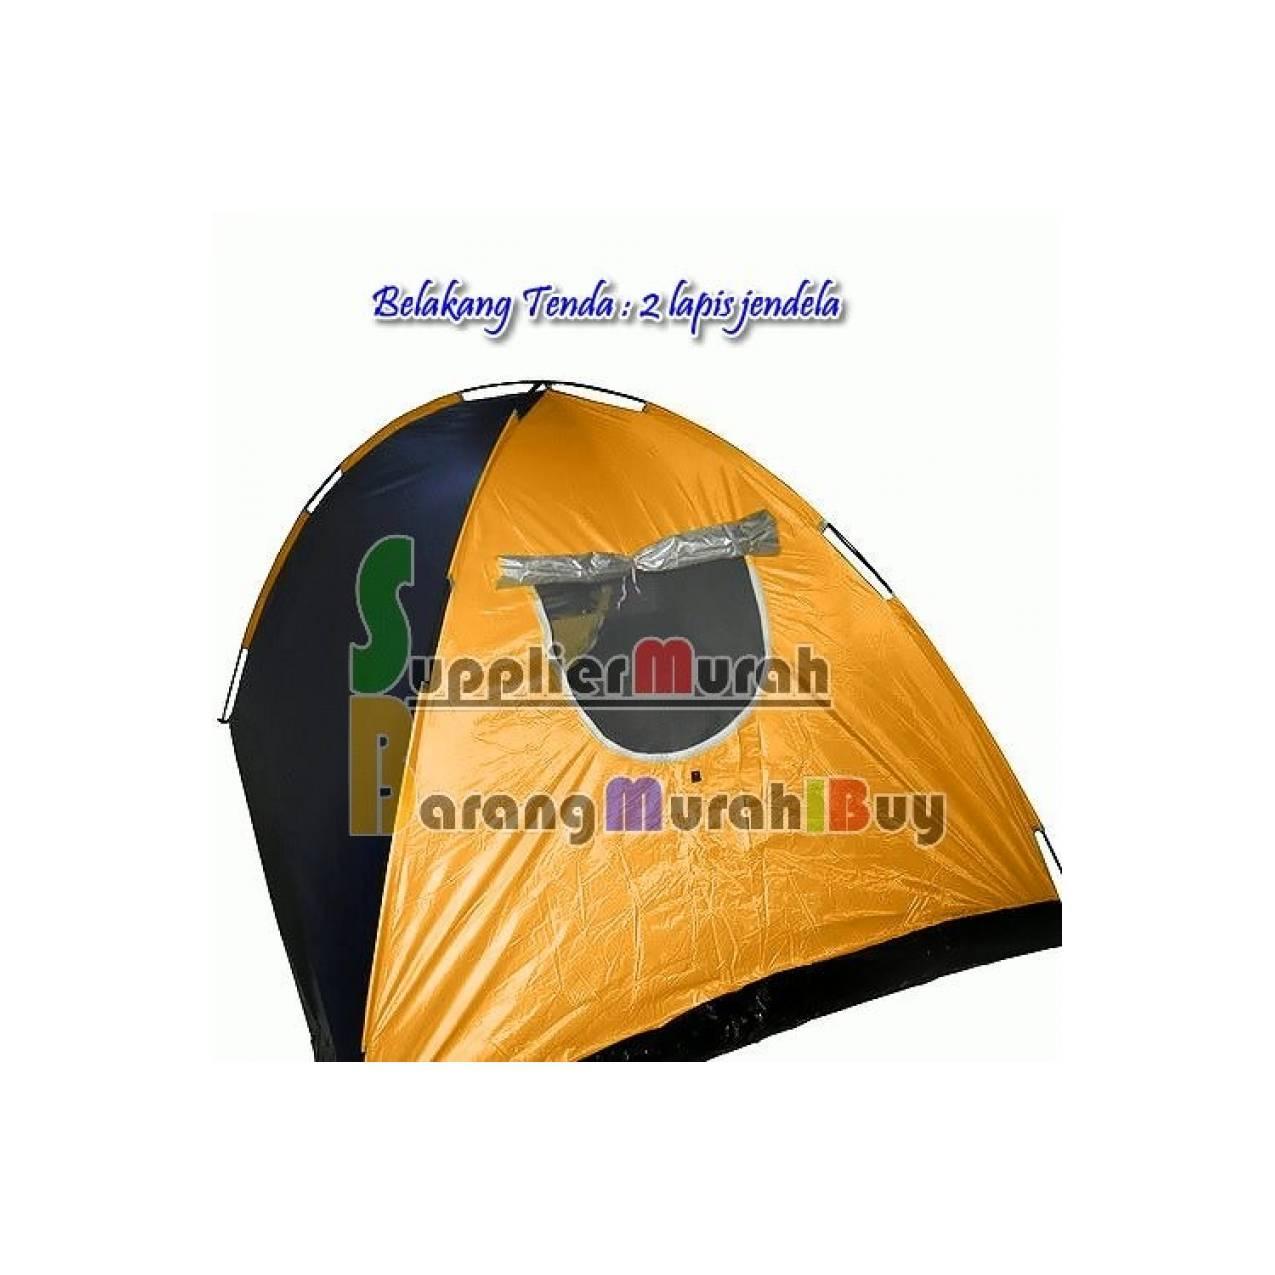 Tenda Camping kemping dome Lipat 6 orang dengan alas tenda dan jaring